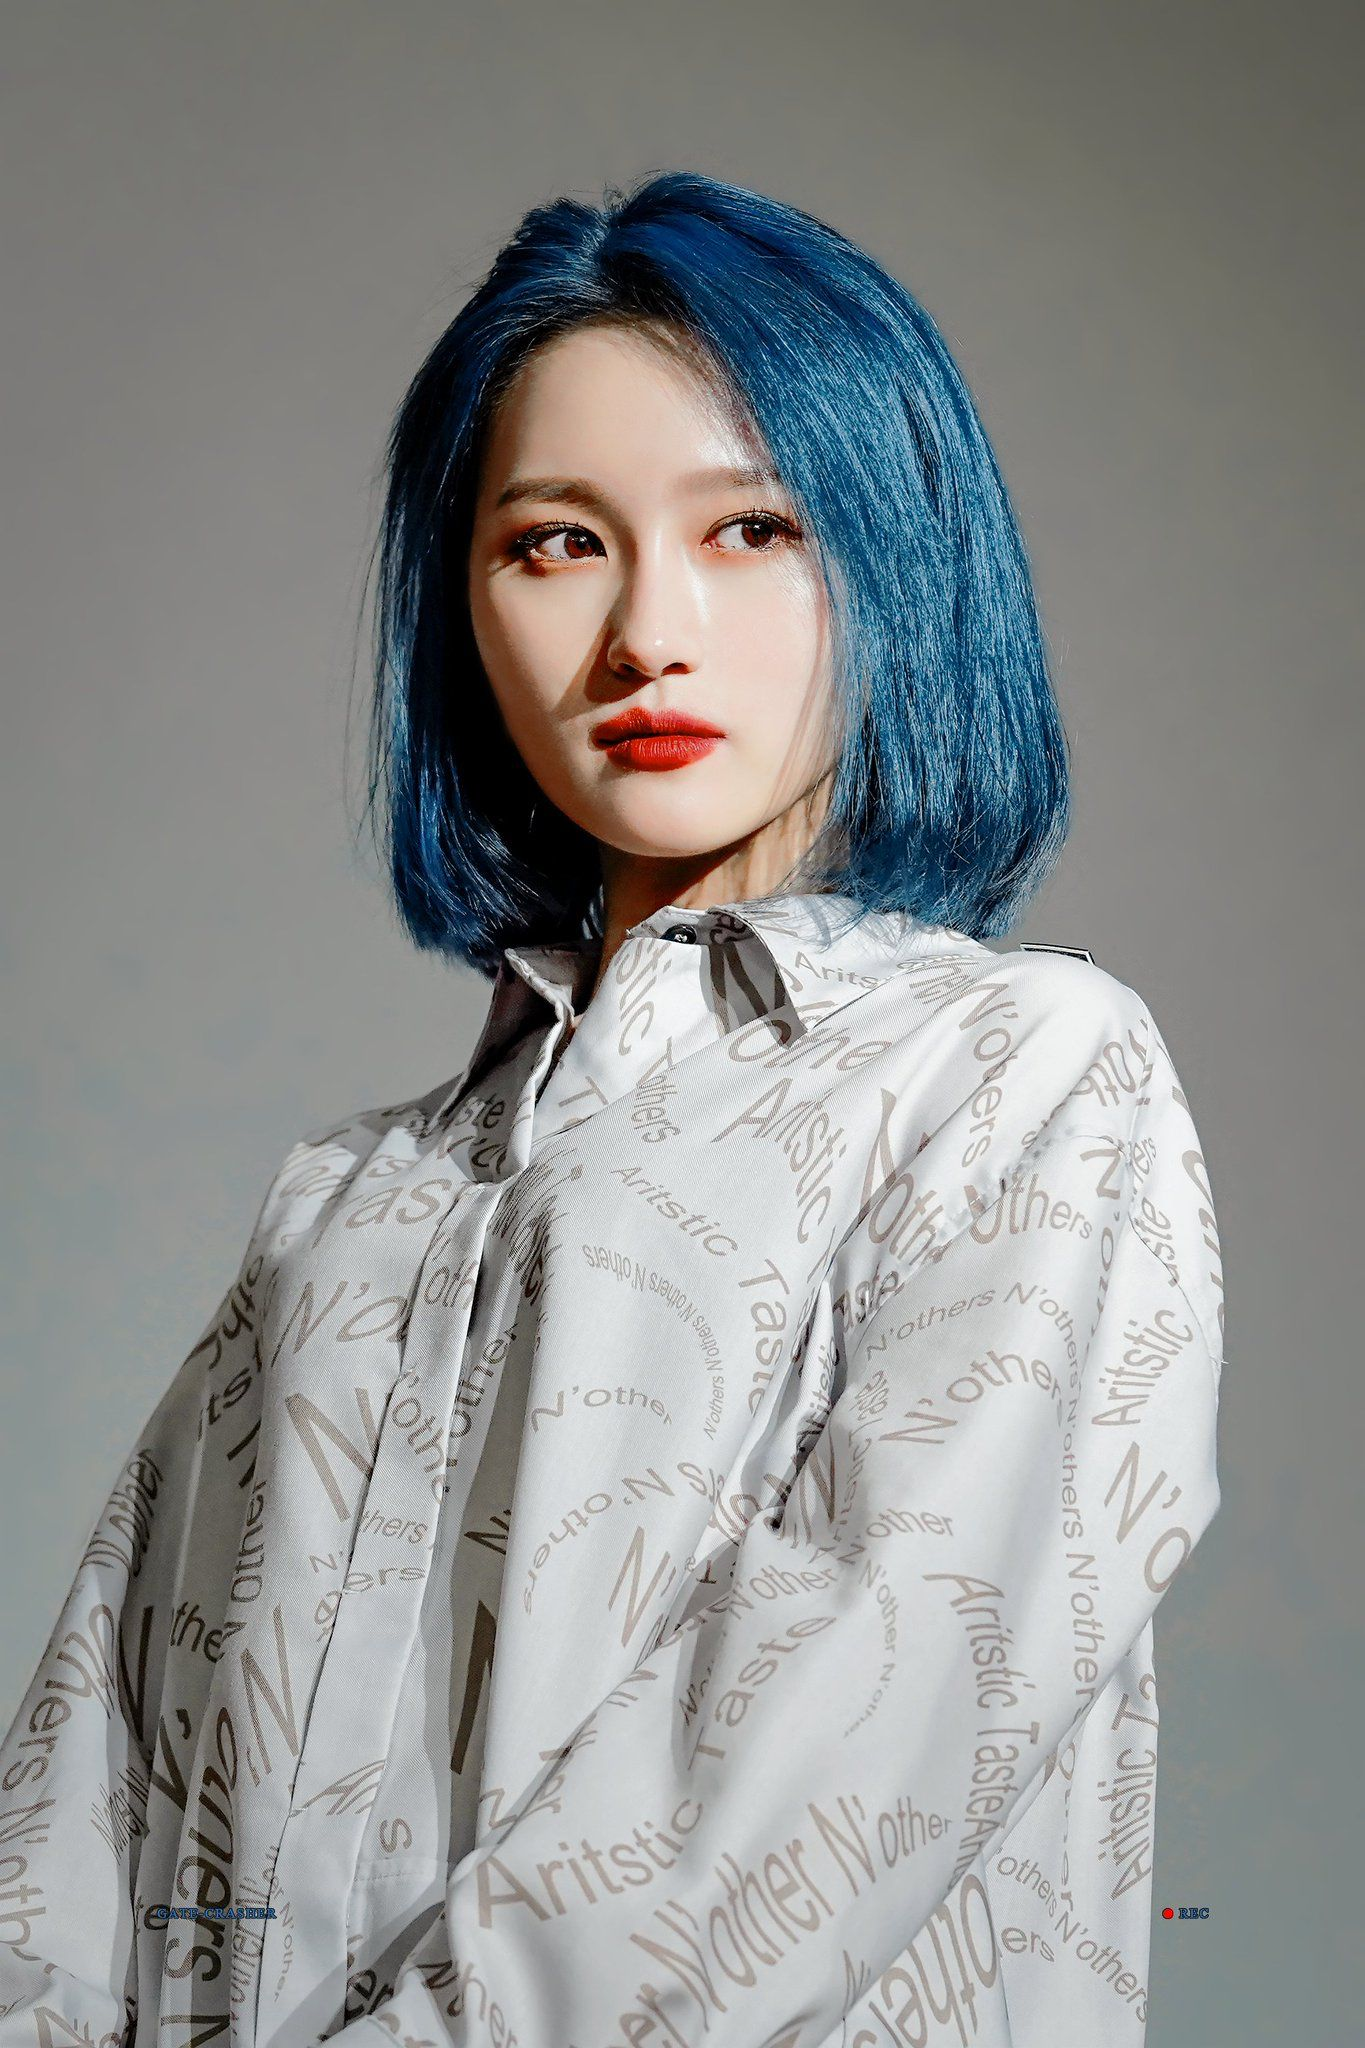 Pin By Josephine Ross On Pretty Kpop Idol Pics Dream Catcher Dream Catcher White Blue Hair